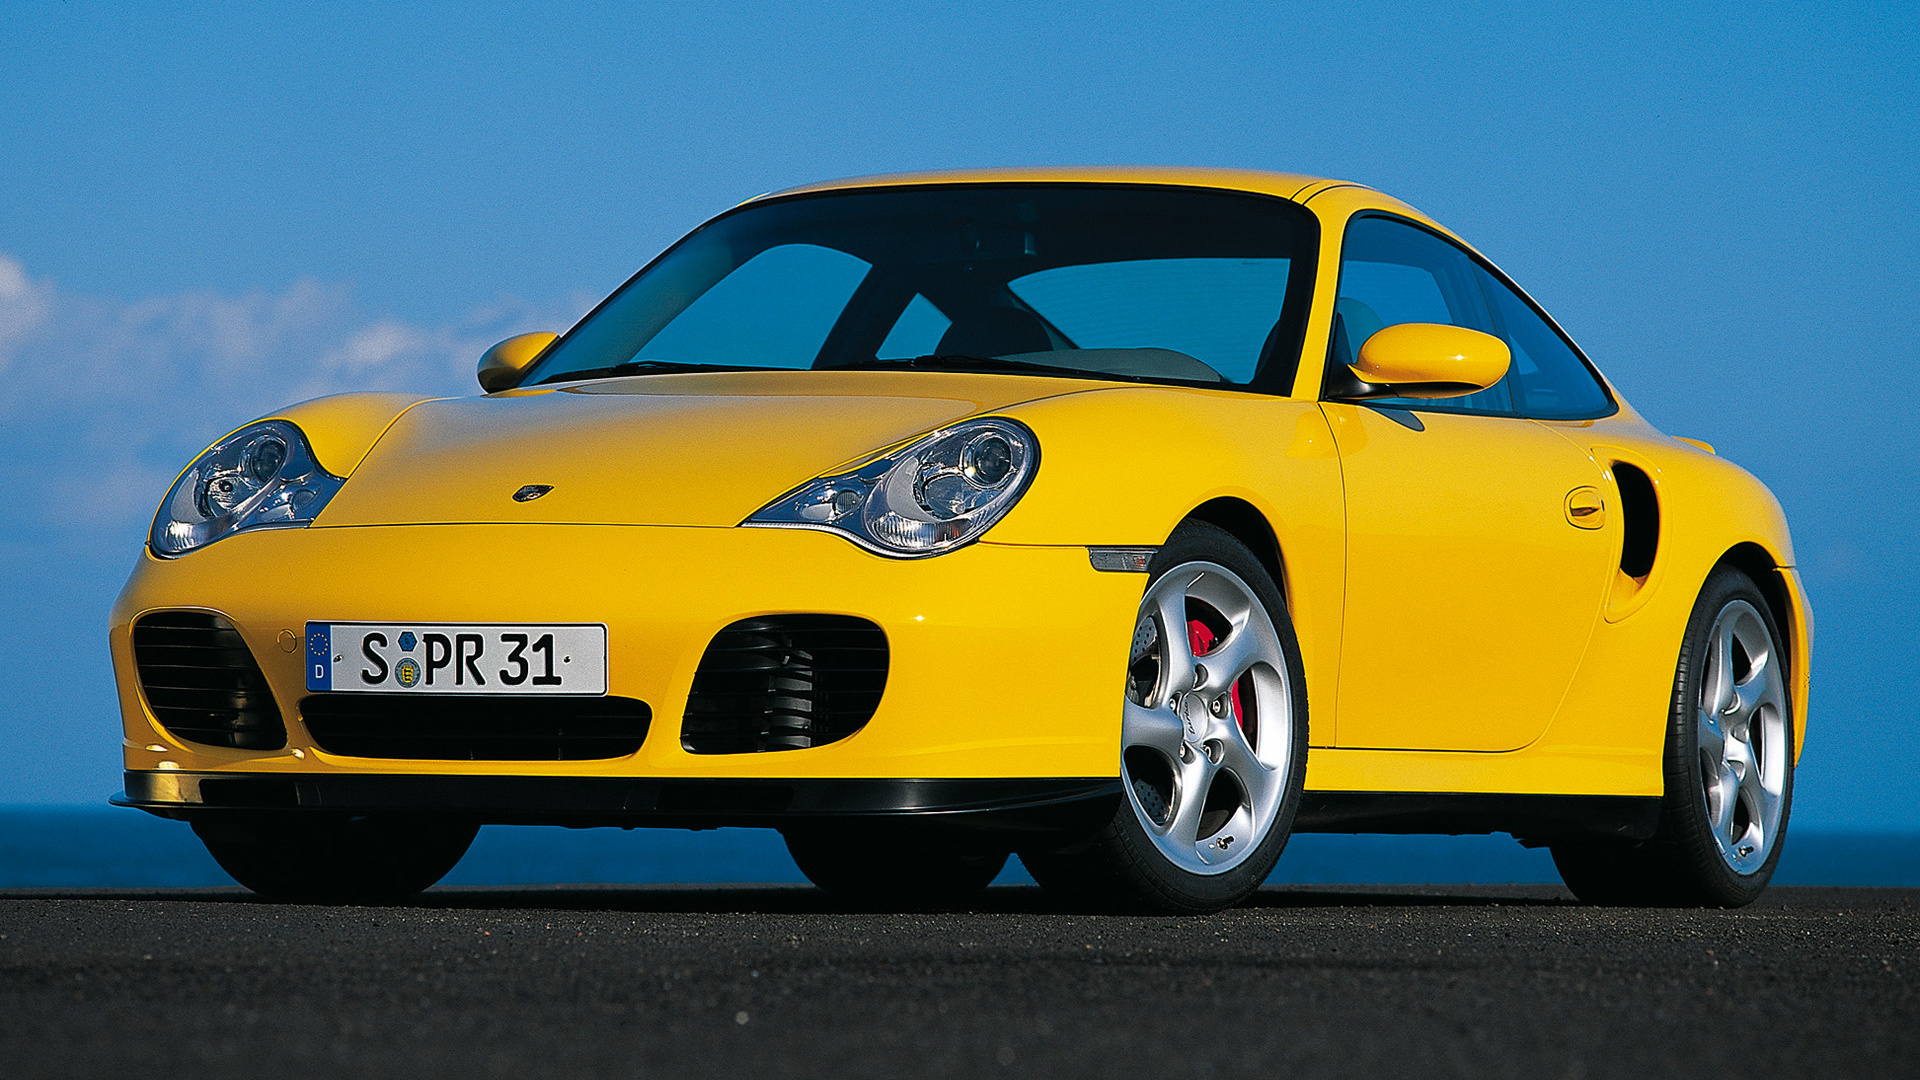 2000 Porsche 911 Turbo